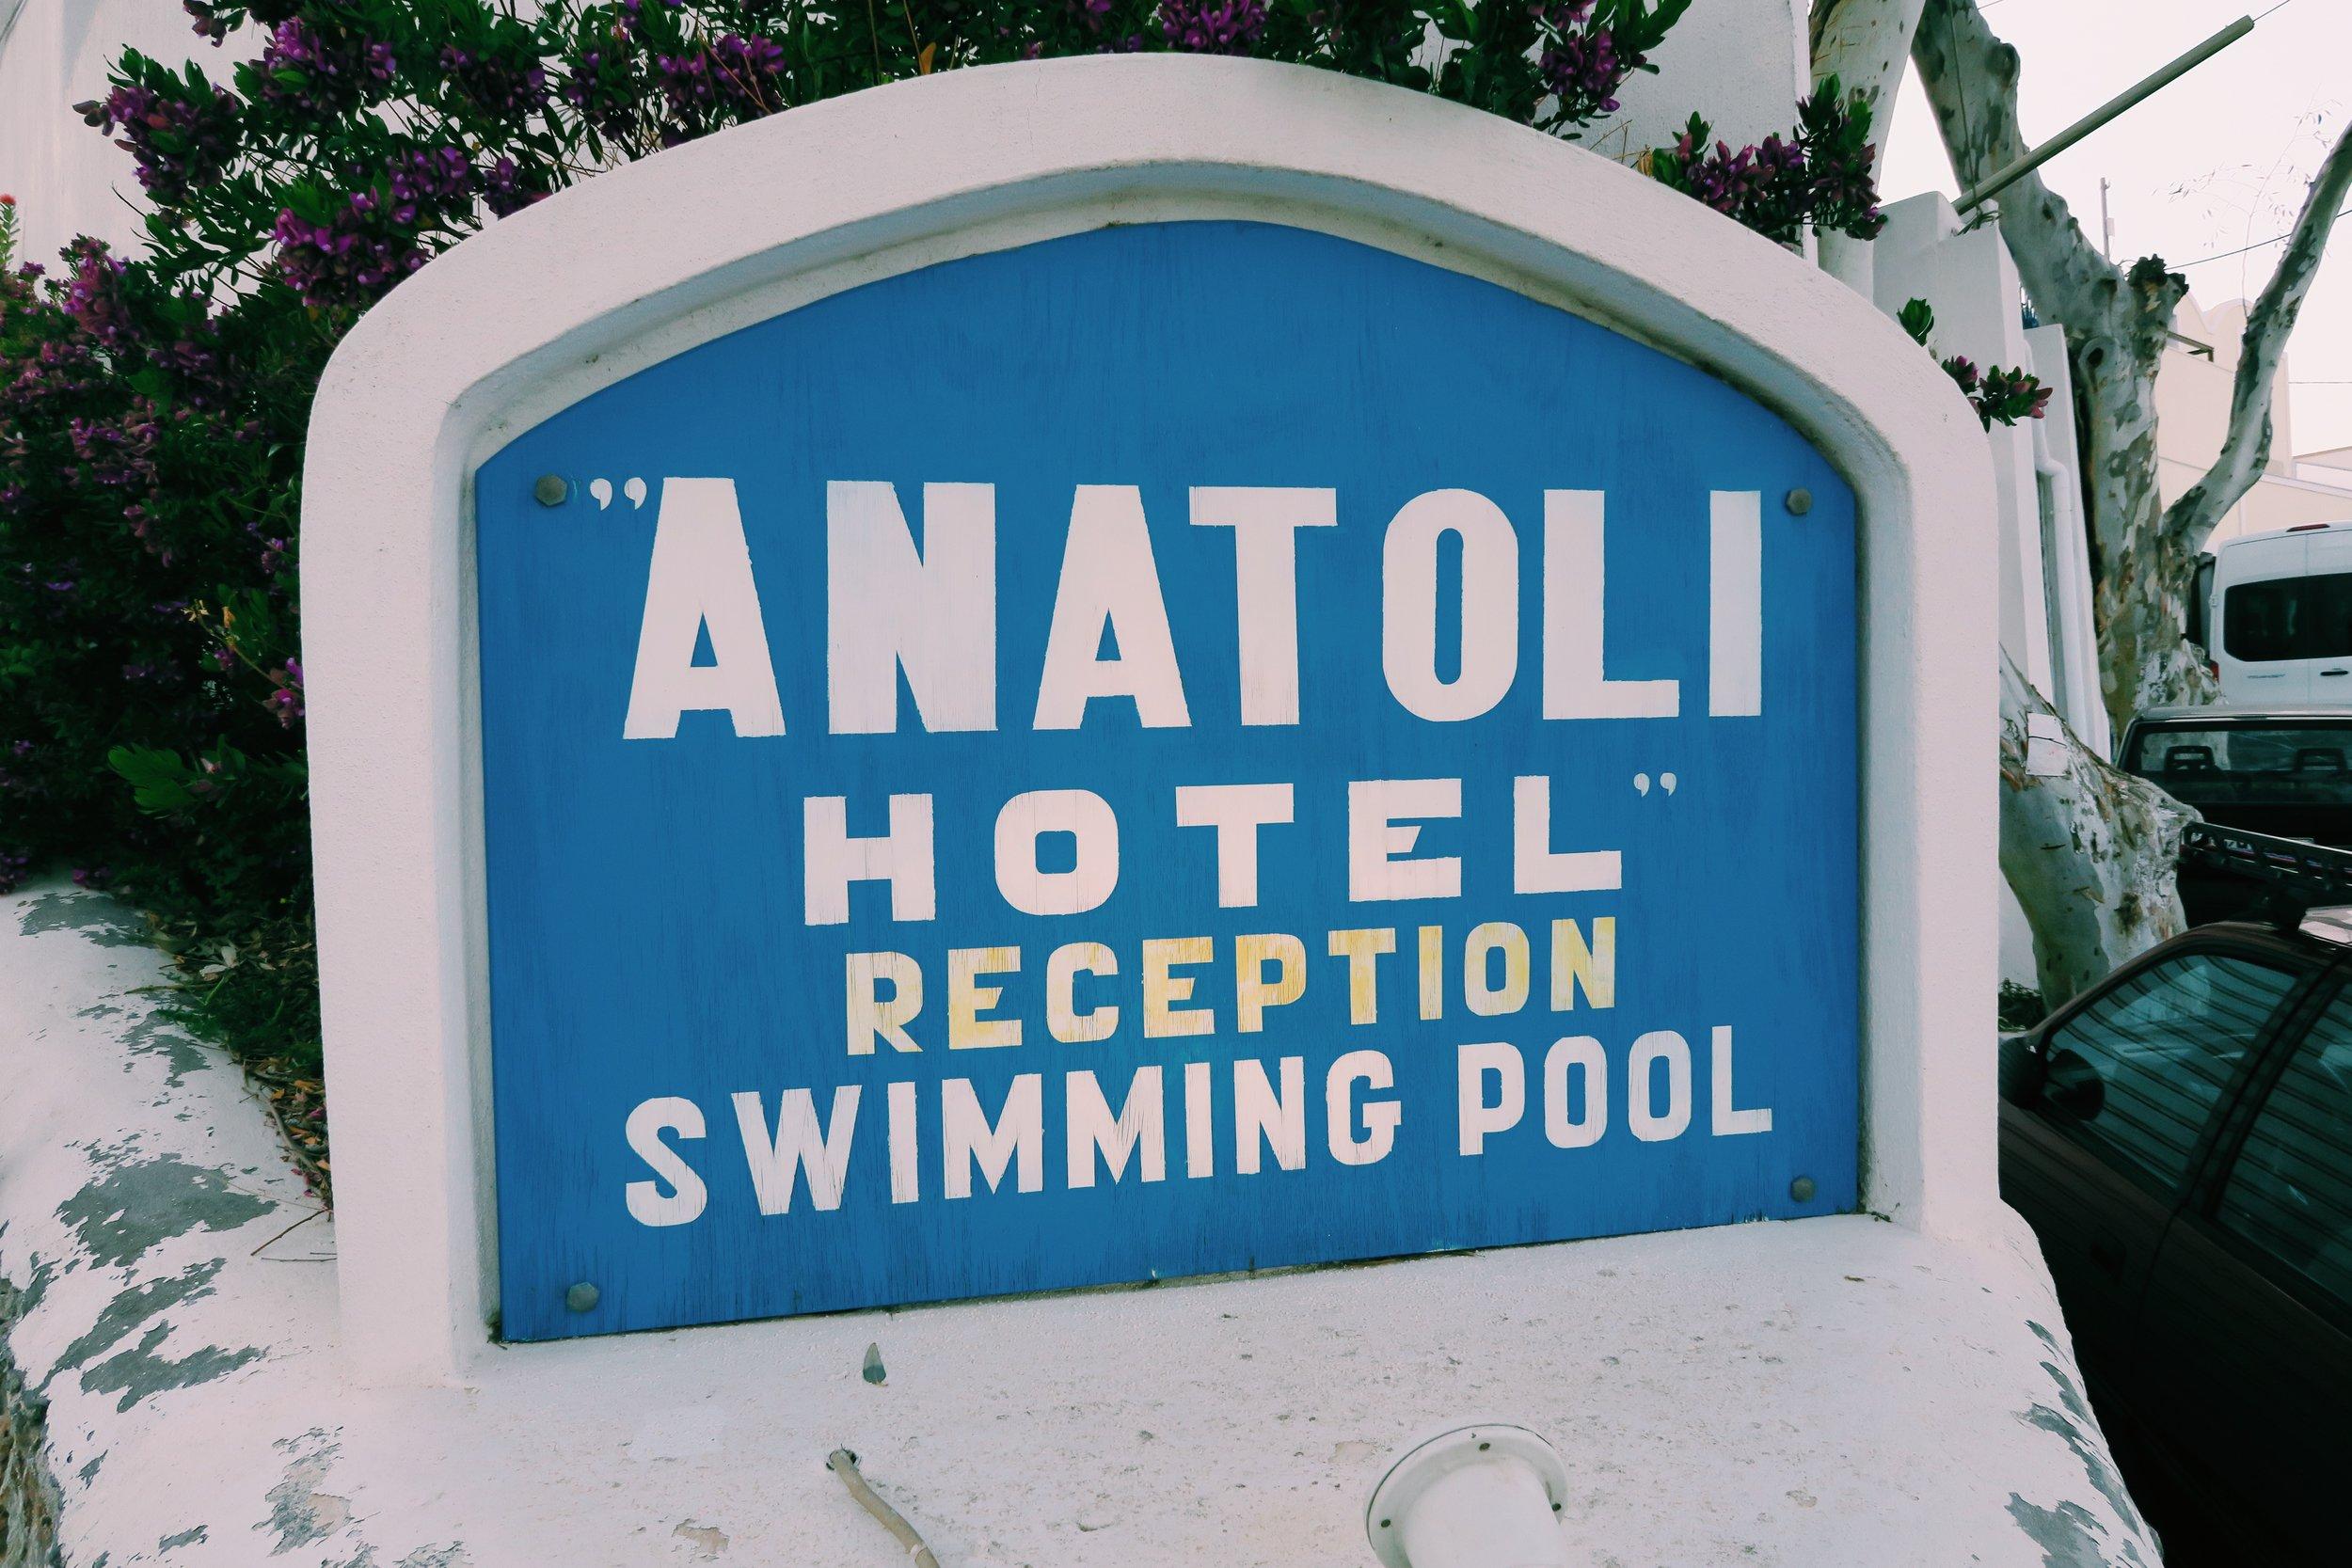 Anatoli Hotel in Fira, Santorini